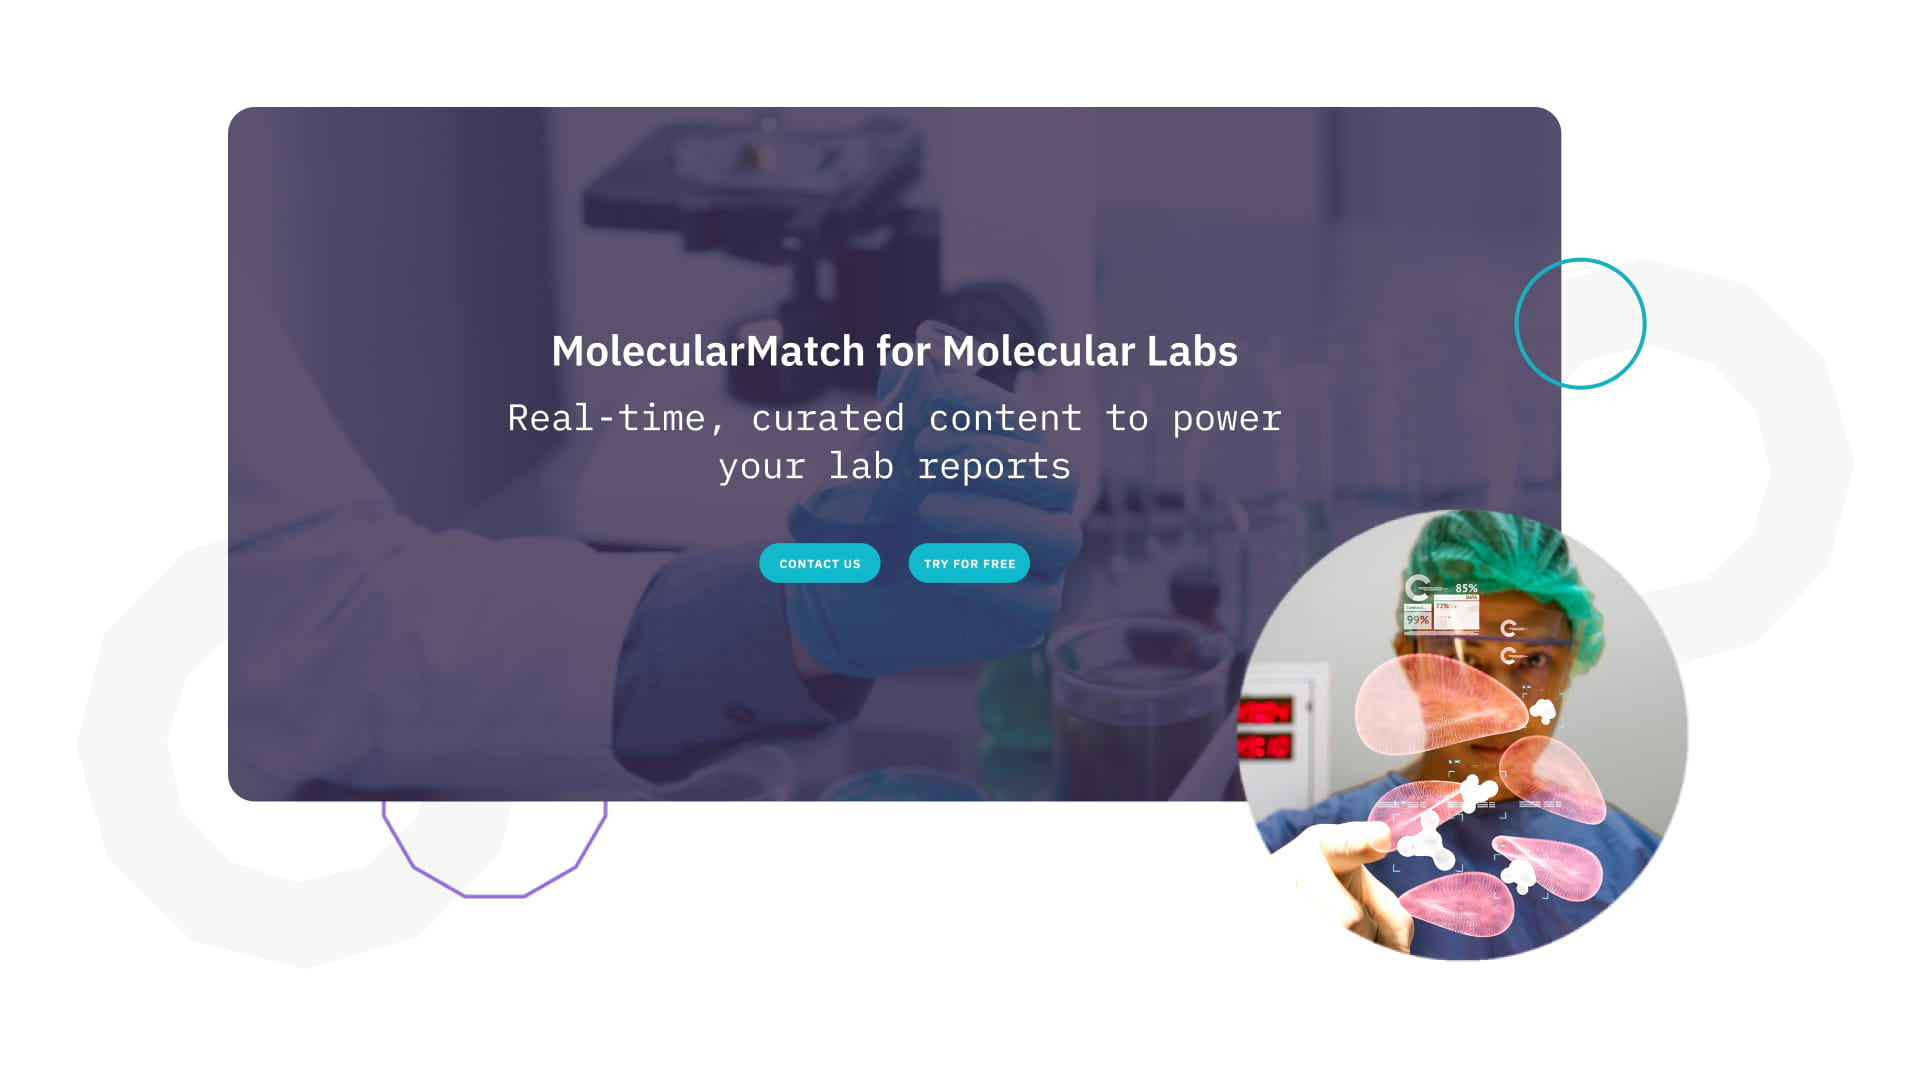 studio-malagon-molecular-match-brand-collage-02